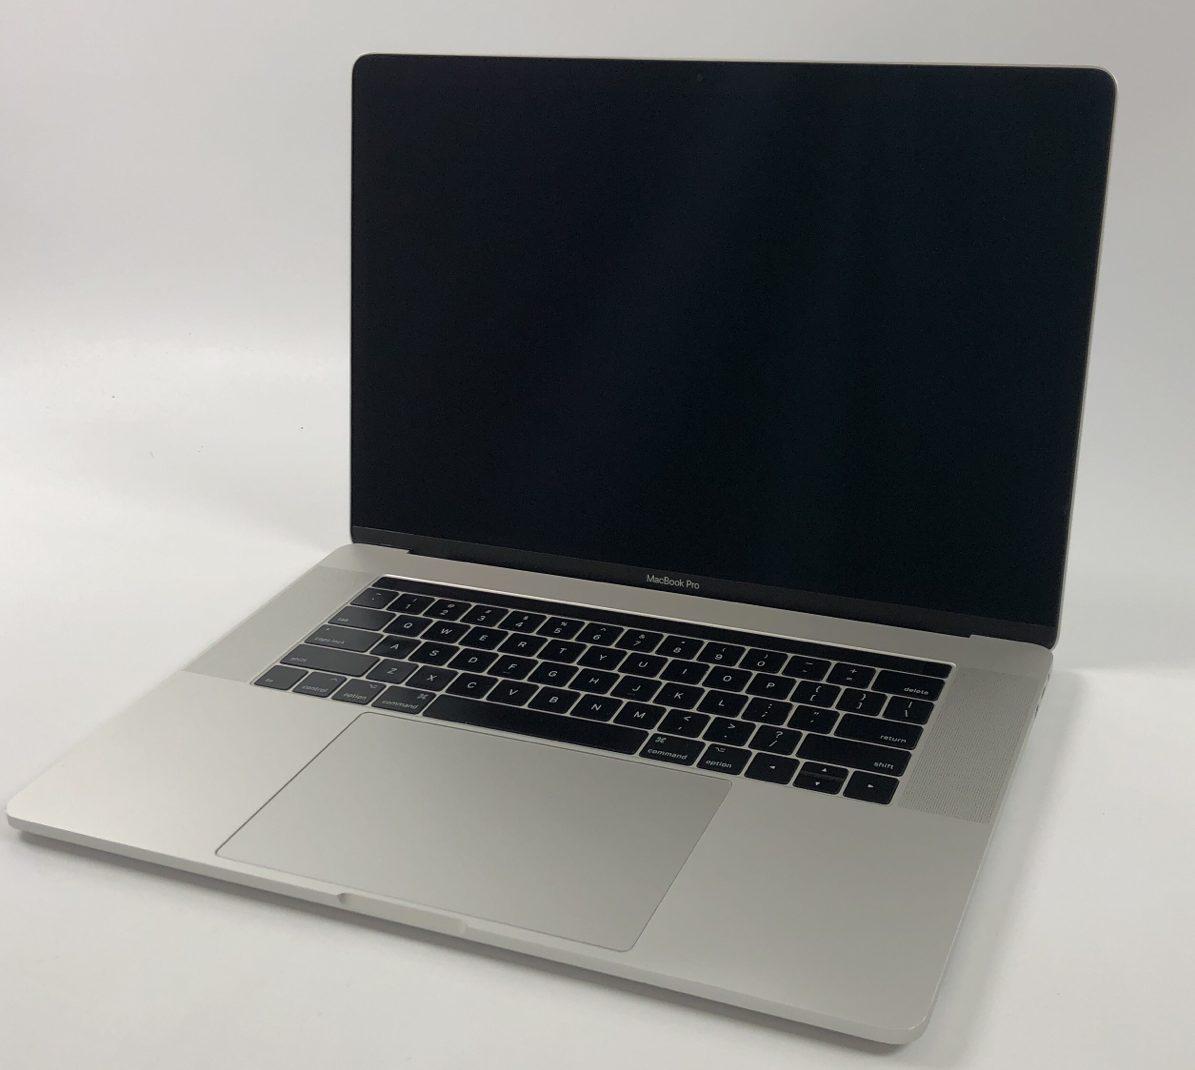 "MacBook Pro 15"" Touch Bar Mid 2017 (Intel Quad-Core i7 3.1 GHz 16 GB RAM 1 TB SSD), Silver, Intel Quad-Core i7 3.1 GHz, 16 GB RAM, 1 TB SSD, image 1"